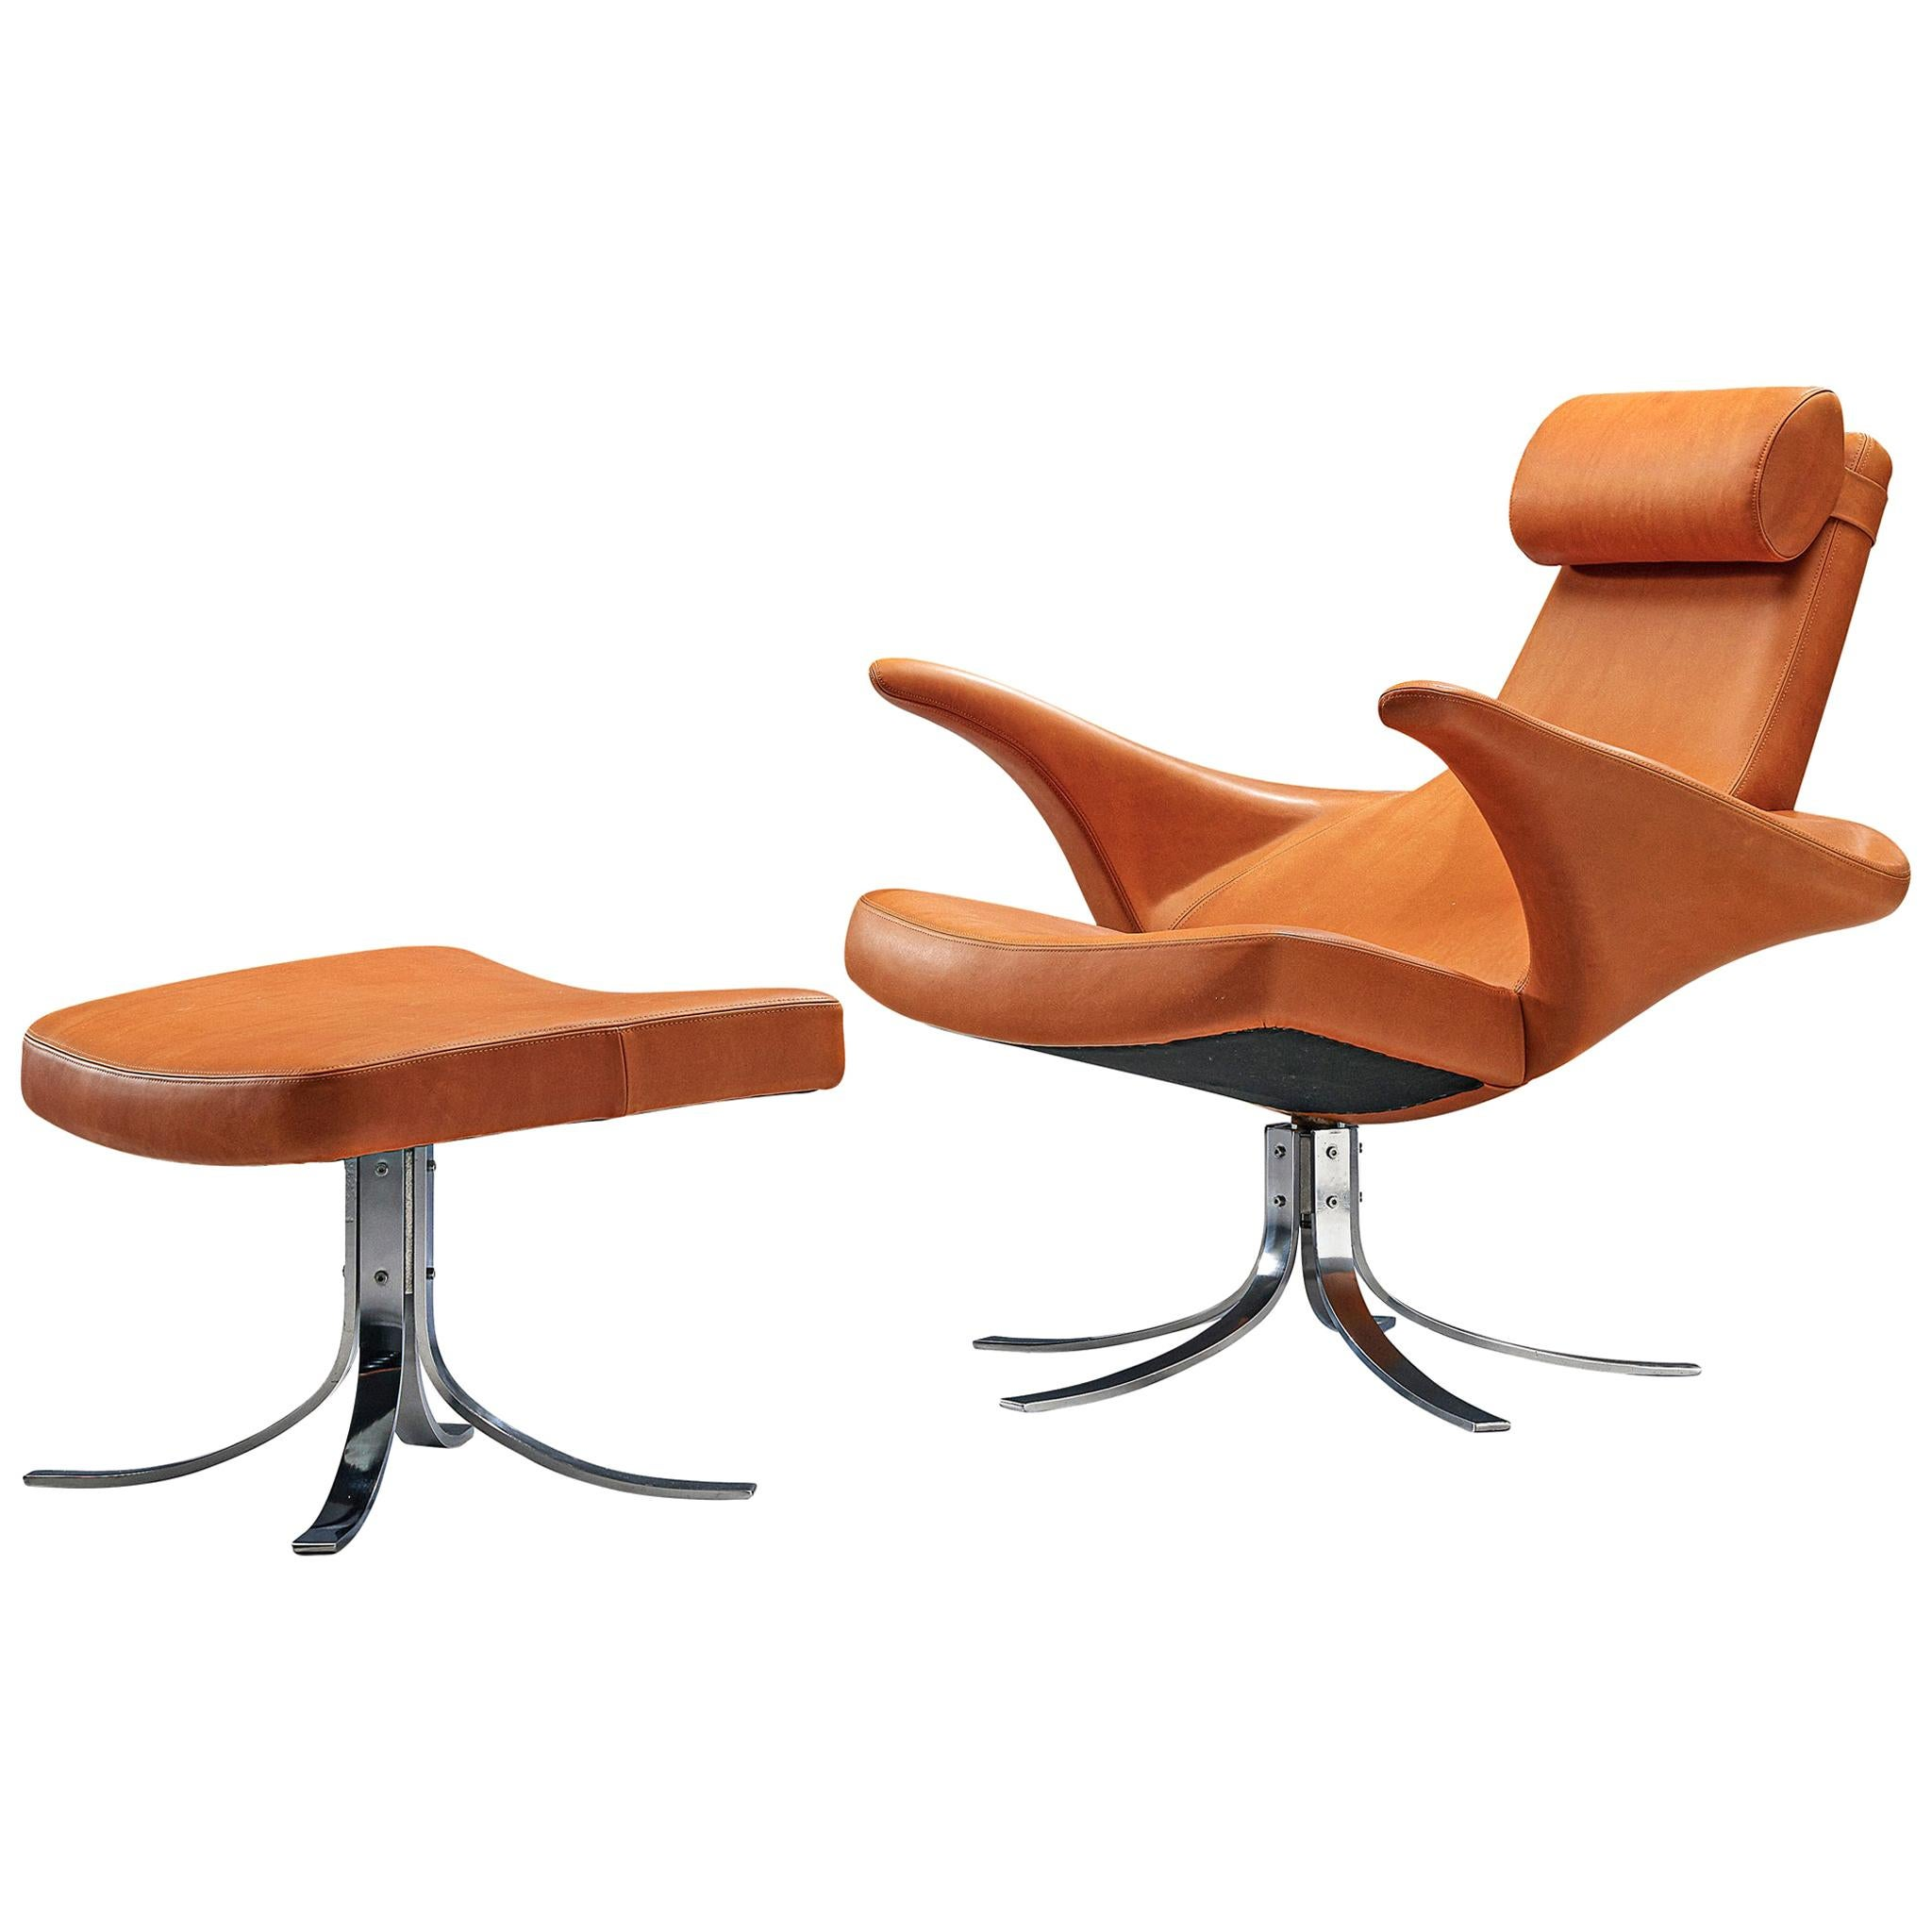 Rare 'Seagull' 9601 Chair with Ottoman by Gösta Berg & Stenerik Eriksson